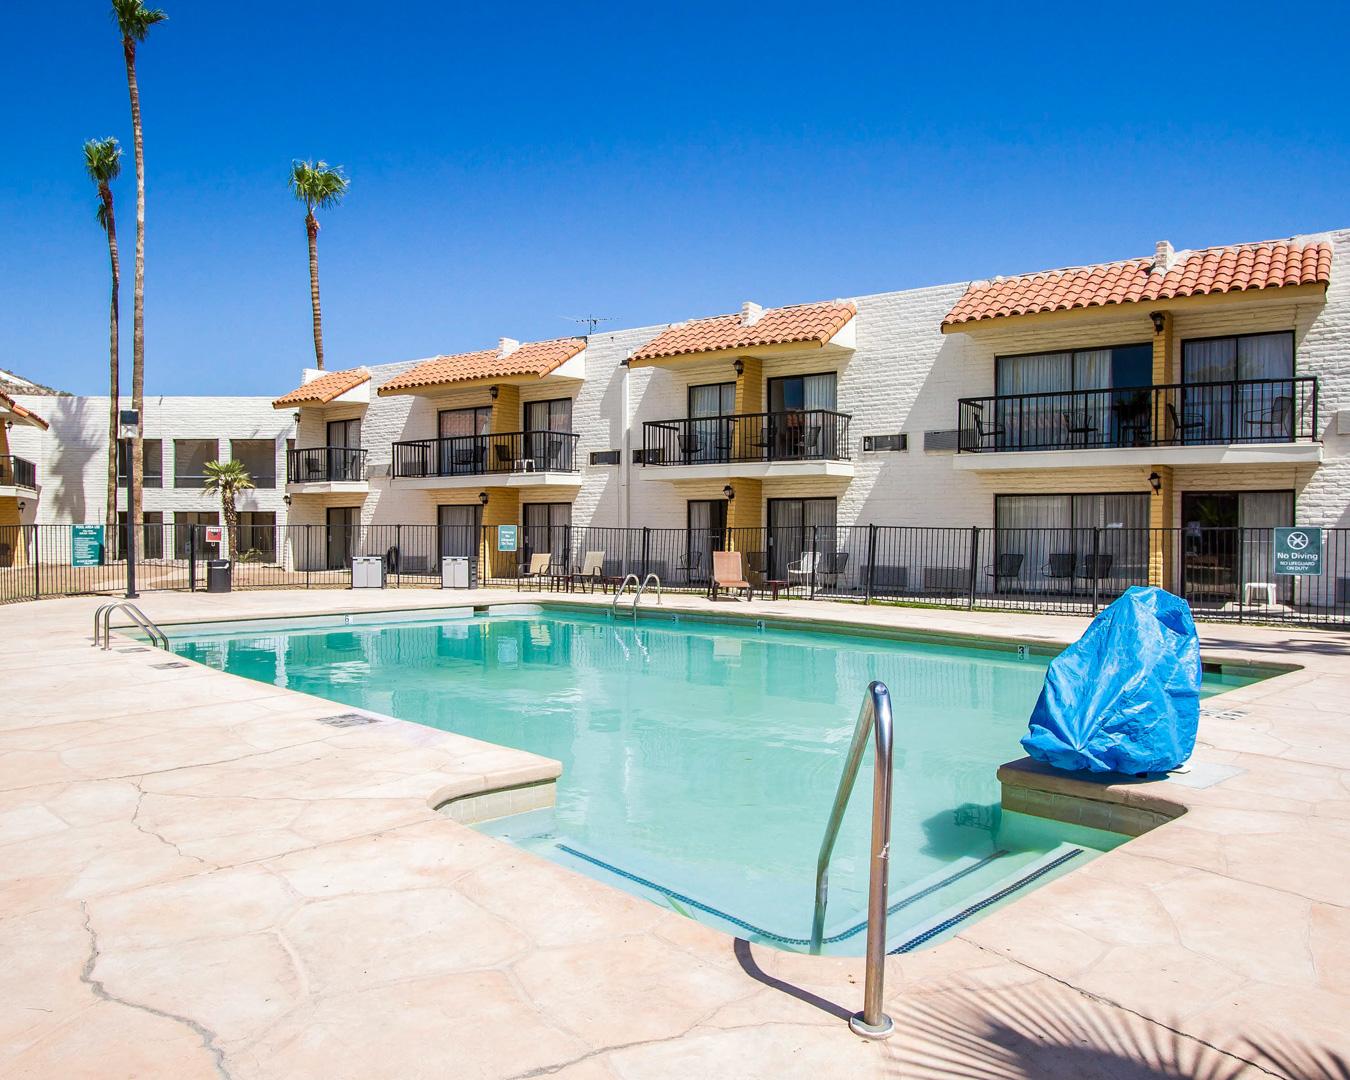 Sep 22, · Now $62 (Was $̶7̶7̶) on TripAdvisor: Quality Inn Tucson Airport, Tucson. See 92 traveler reviews, 42 candid photos, and great deals for Quality Inn Tucson Airport, ranked # of hotels in Tucson and rated 3 of 5 at TripAdvisor.3/5(97).